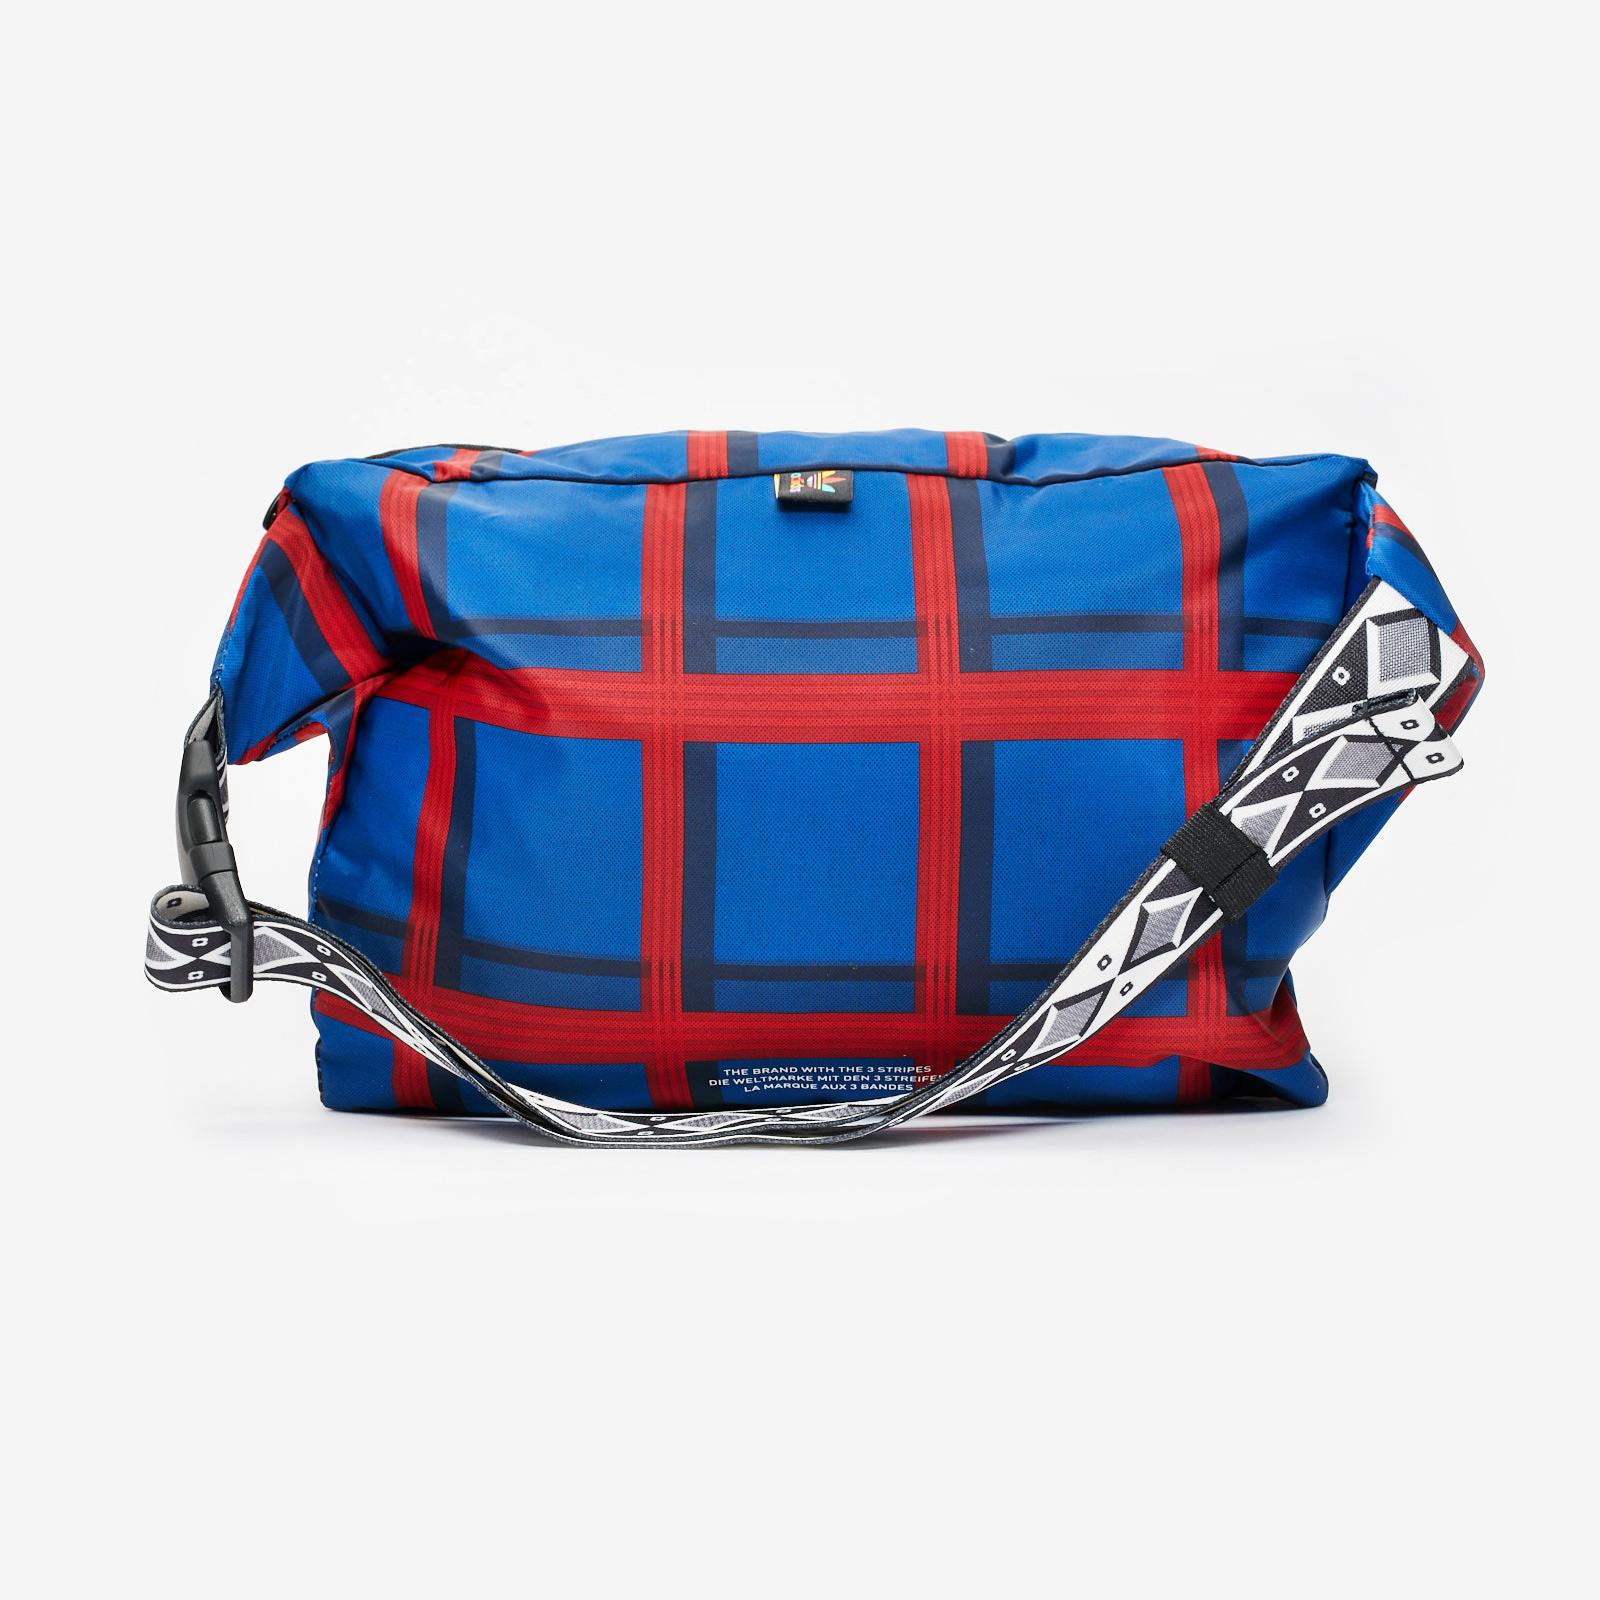 adidas PW Solar HU Waist Bag - Ea3428 - Sneakersnstuff  1469468884d4e